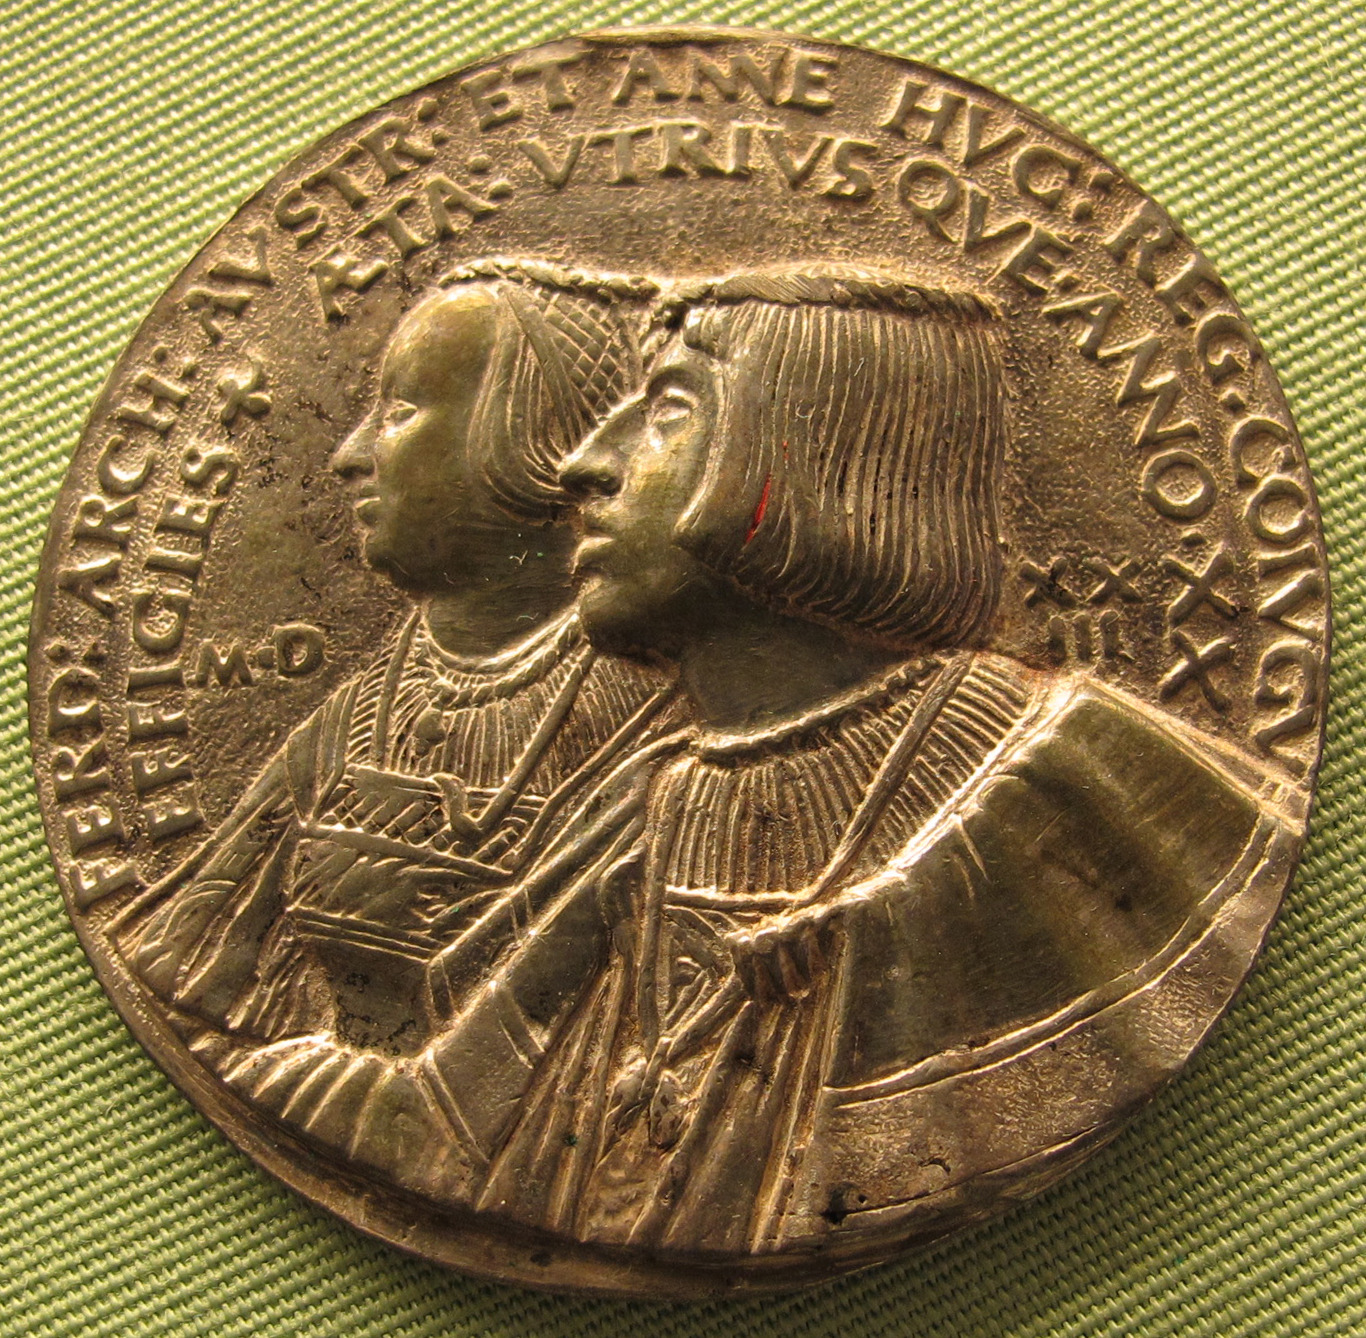 File:Hans daucher, ferdinando I e anna di boemia, 1523.JPG